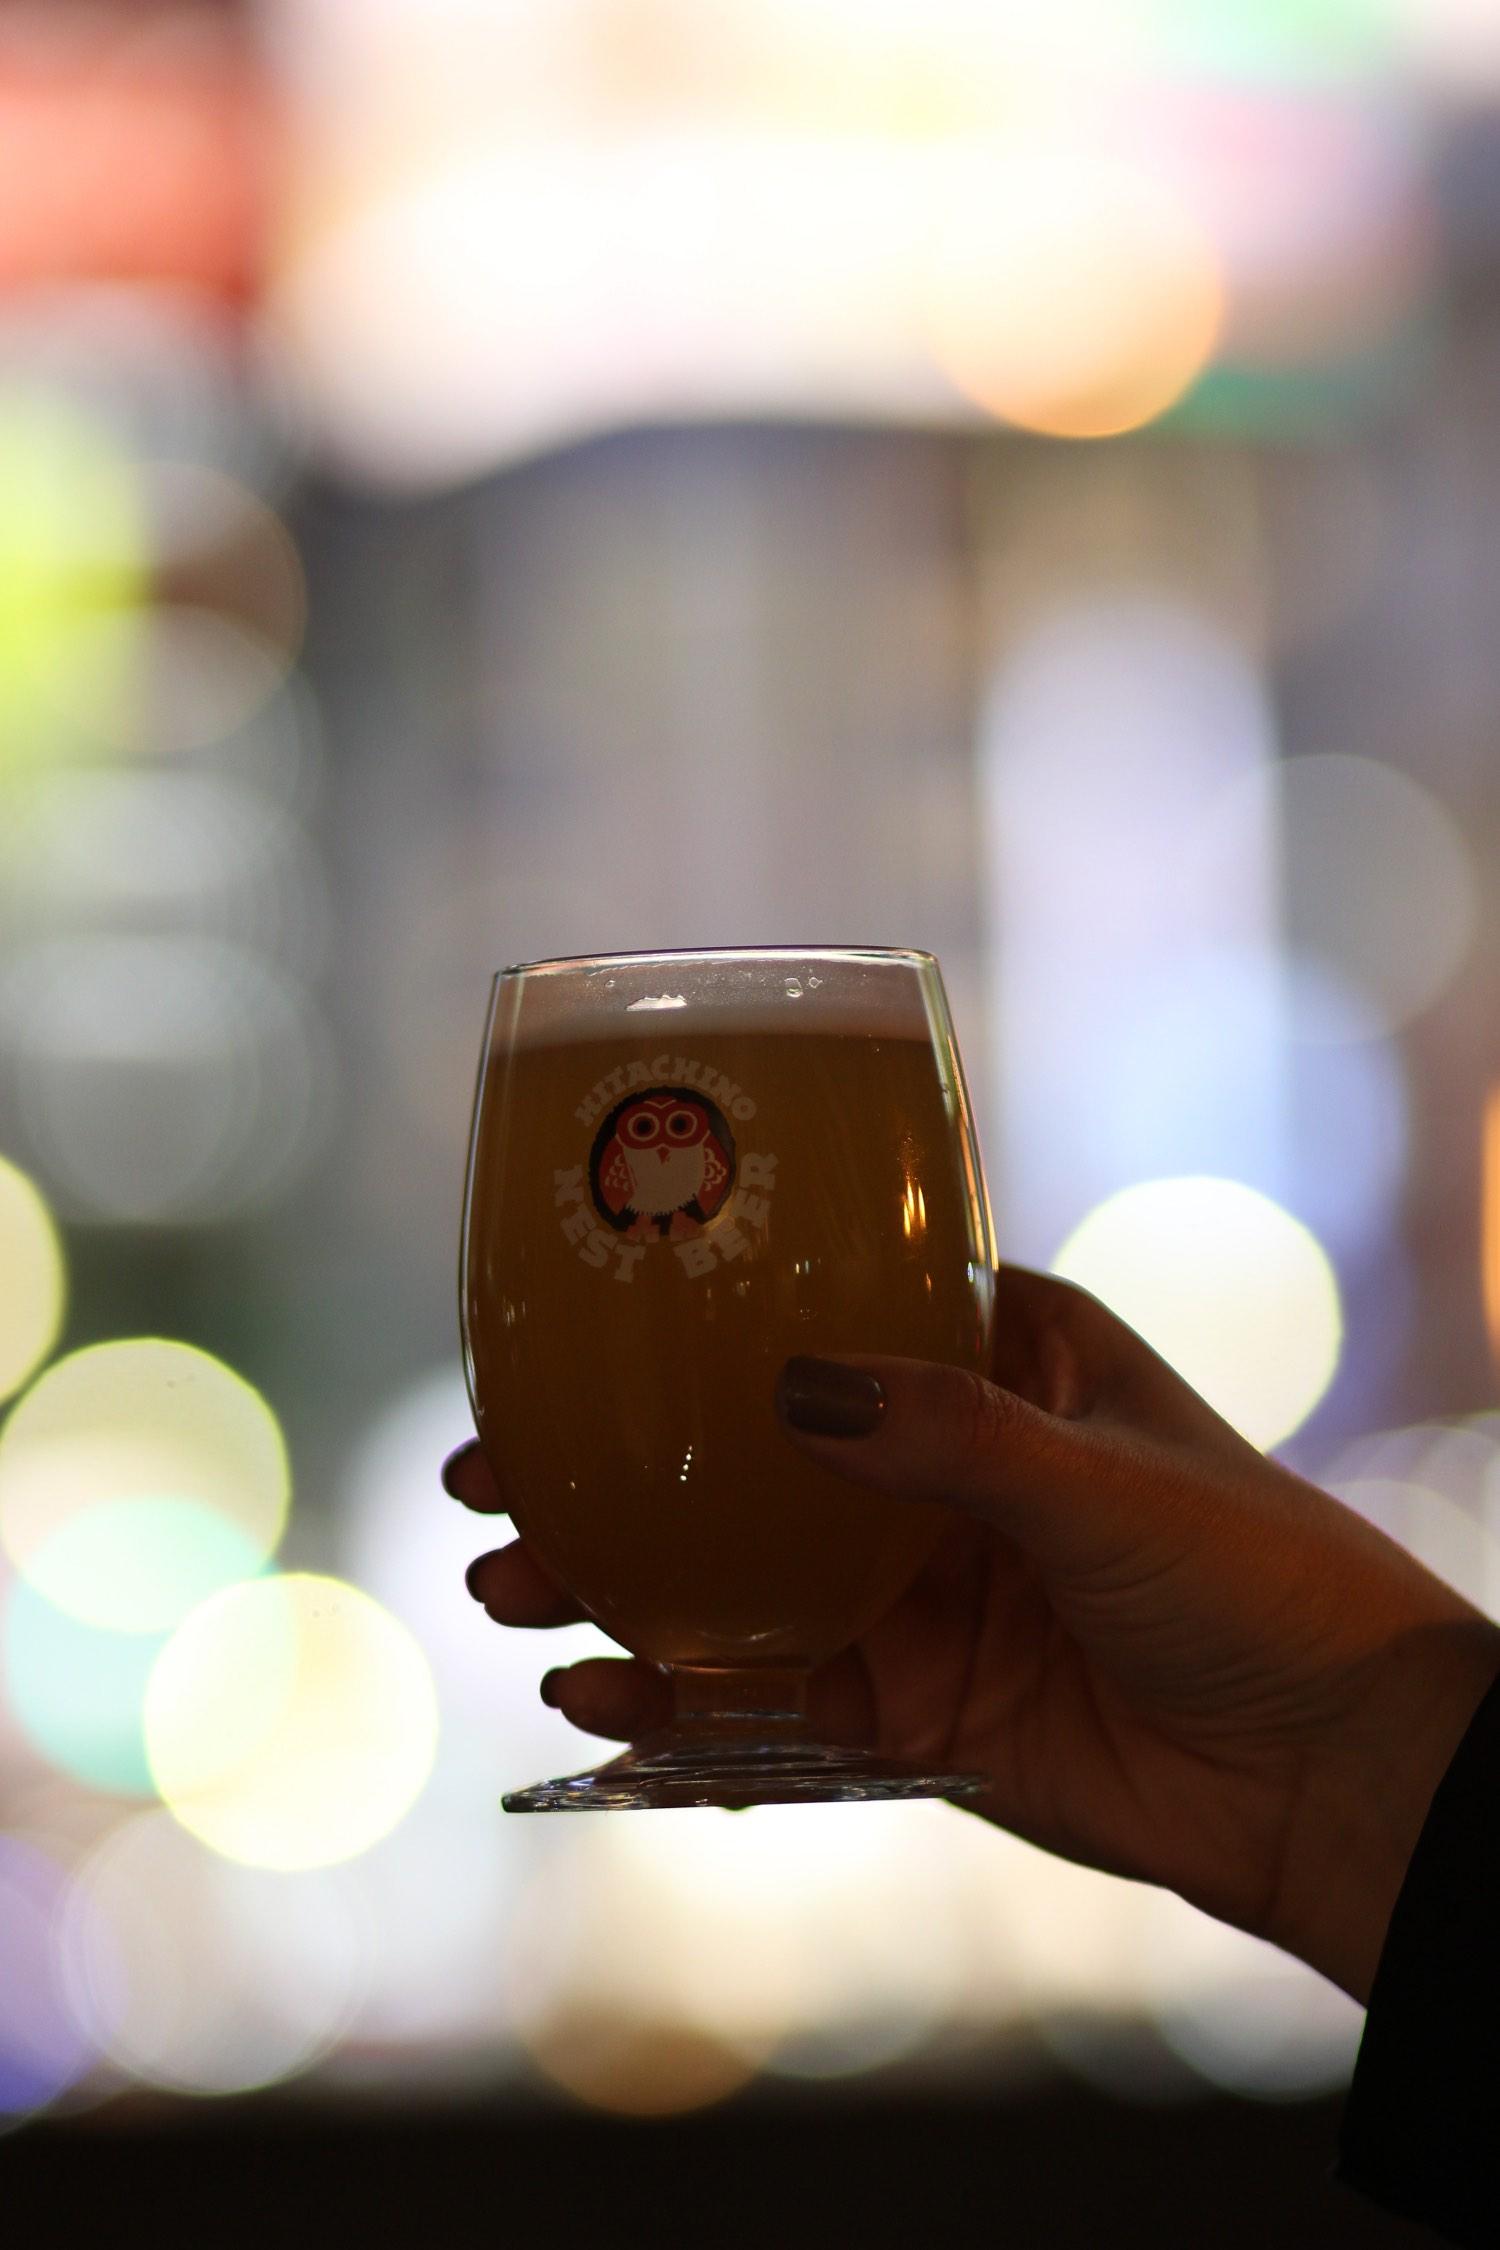 hitachino brewery in ginza tokyo